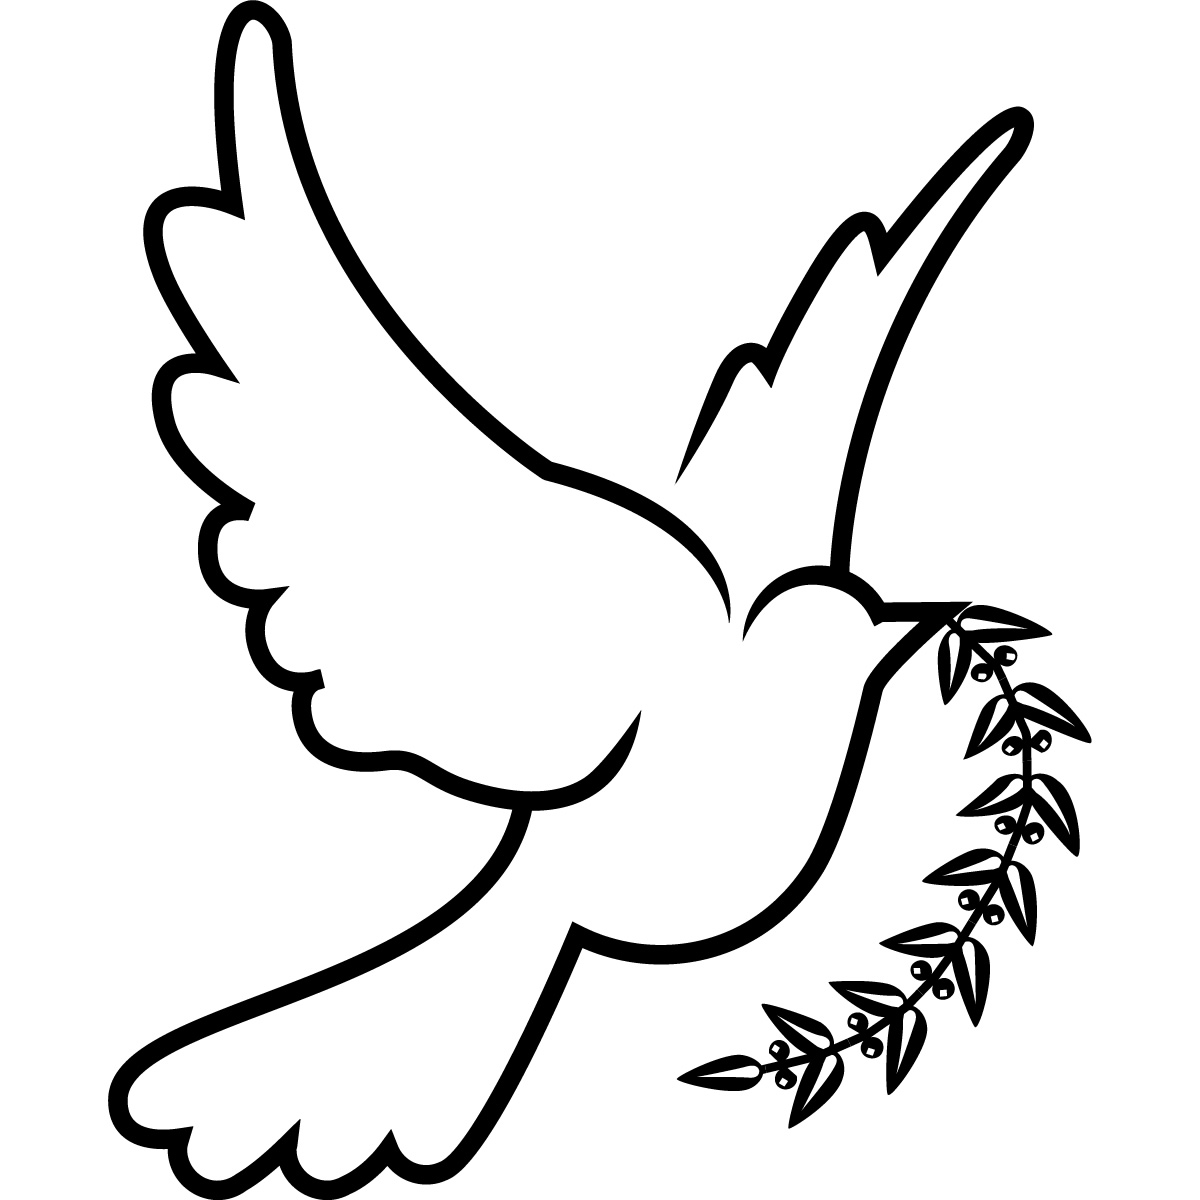 Catholic Confirmation Symbols Clip Art N5 free image.